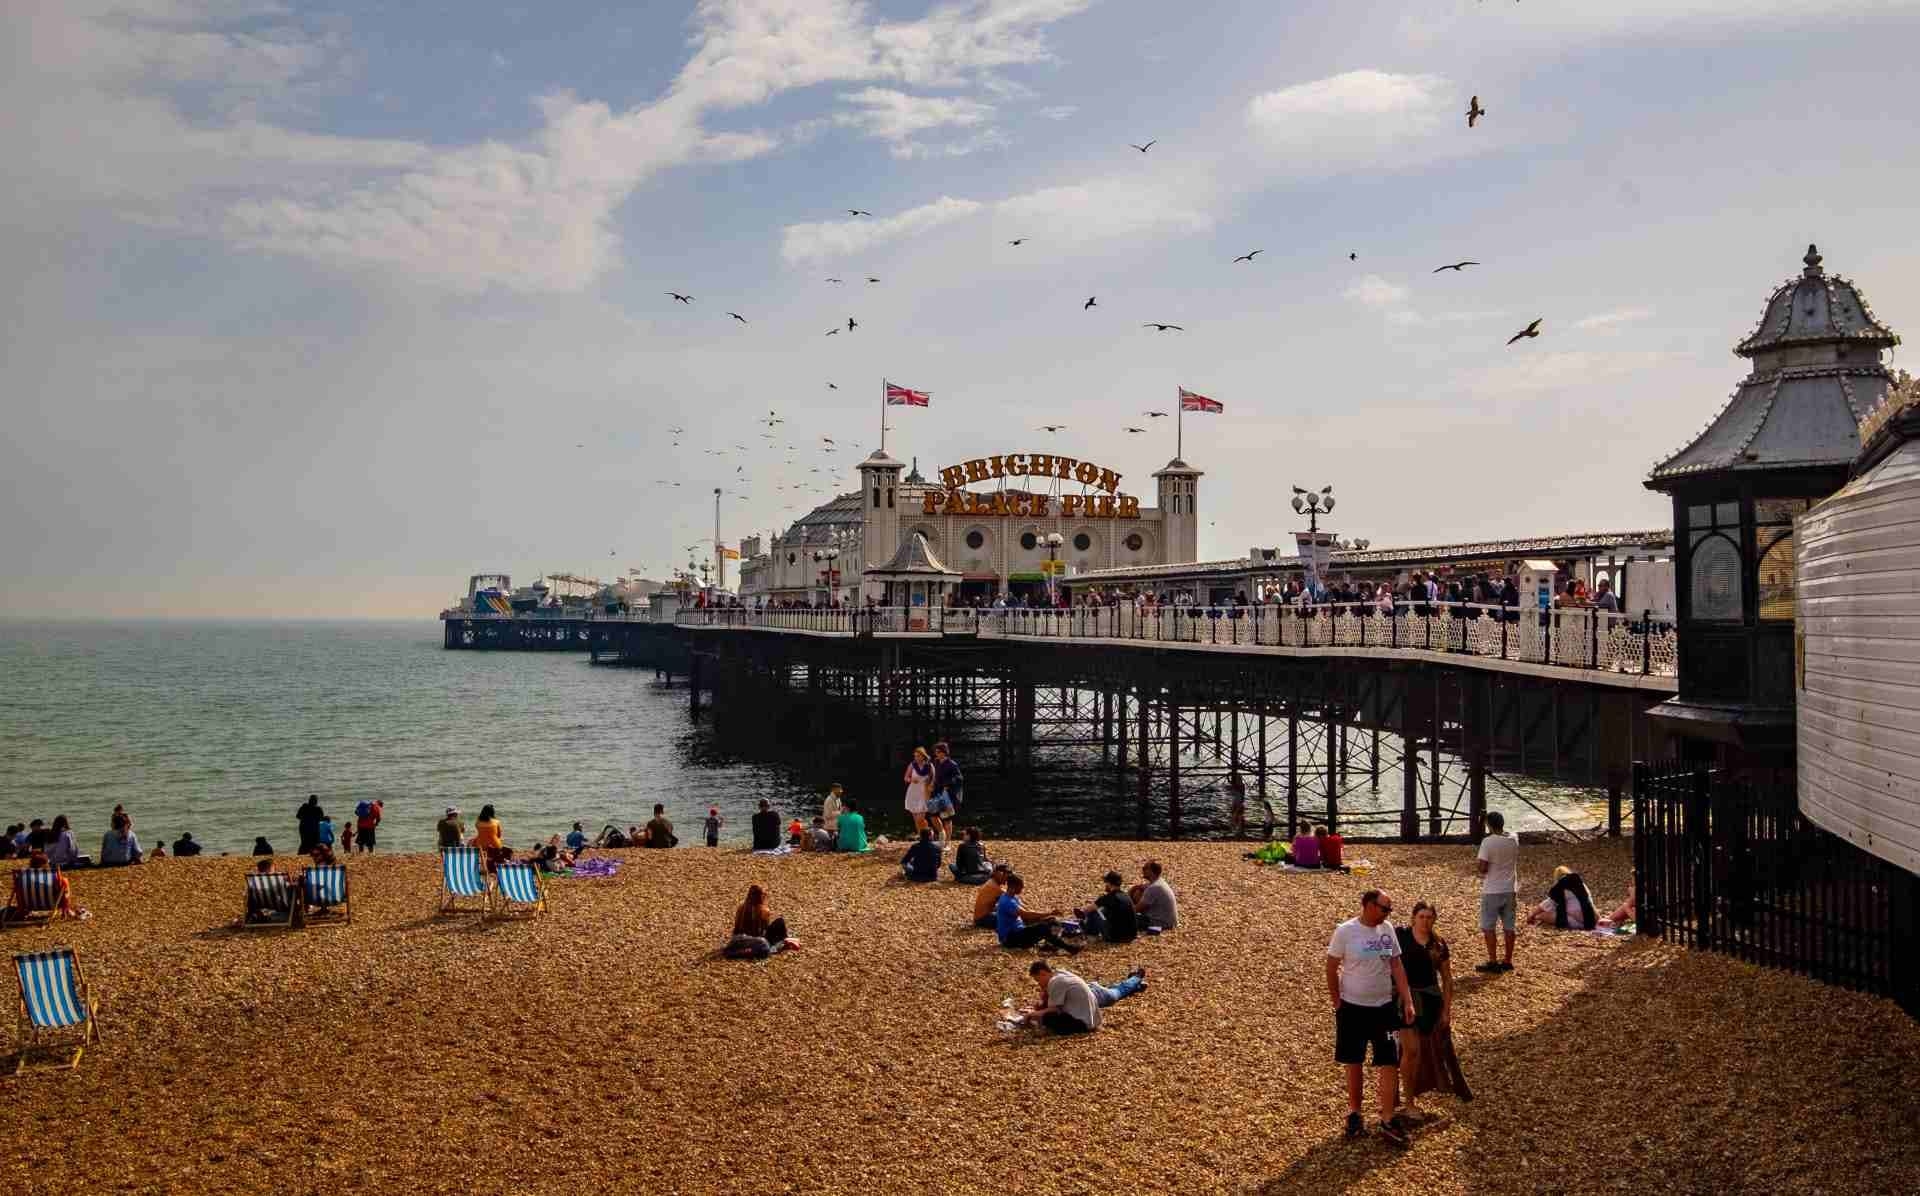 Brighton image